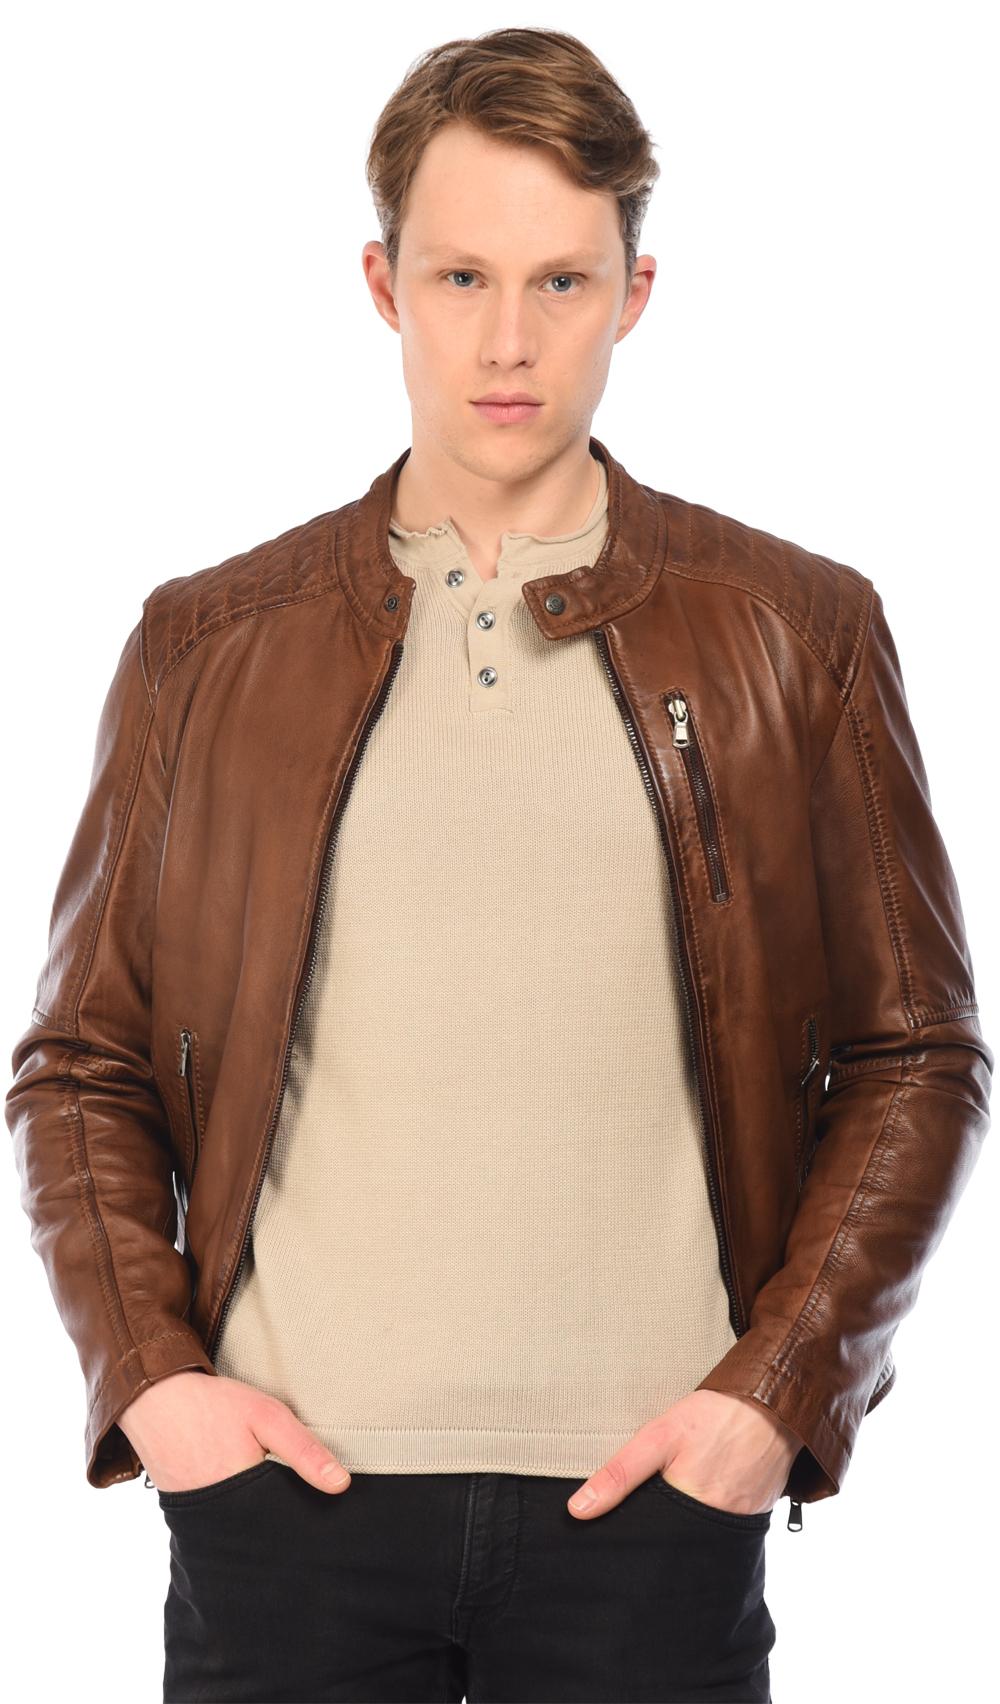 96bf0d3d89fb Jackor & Ytterkläder | Herr | Shoppa online på Afound.com